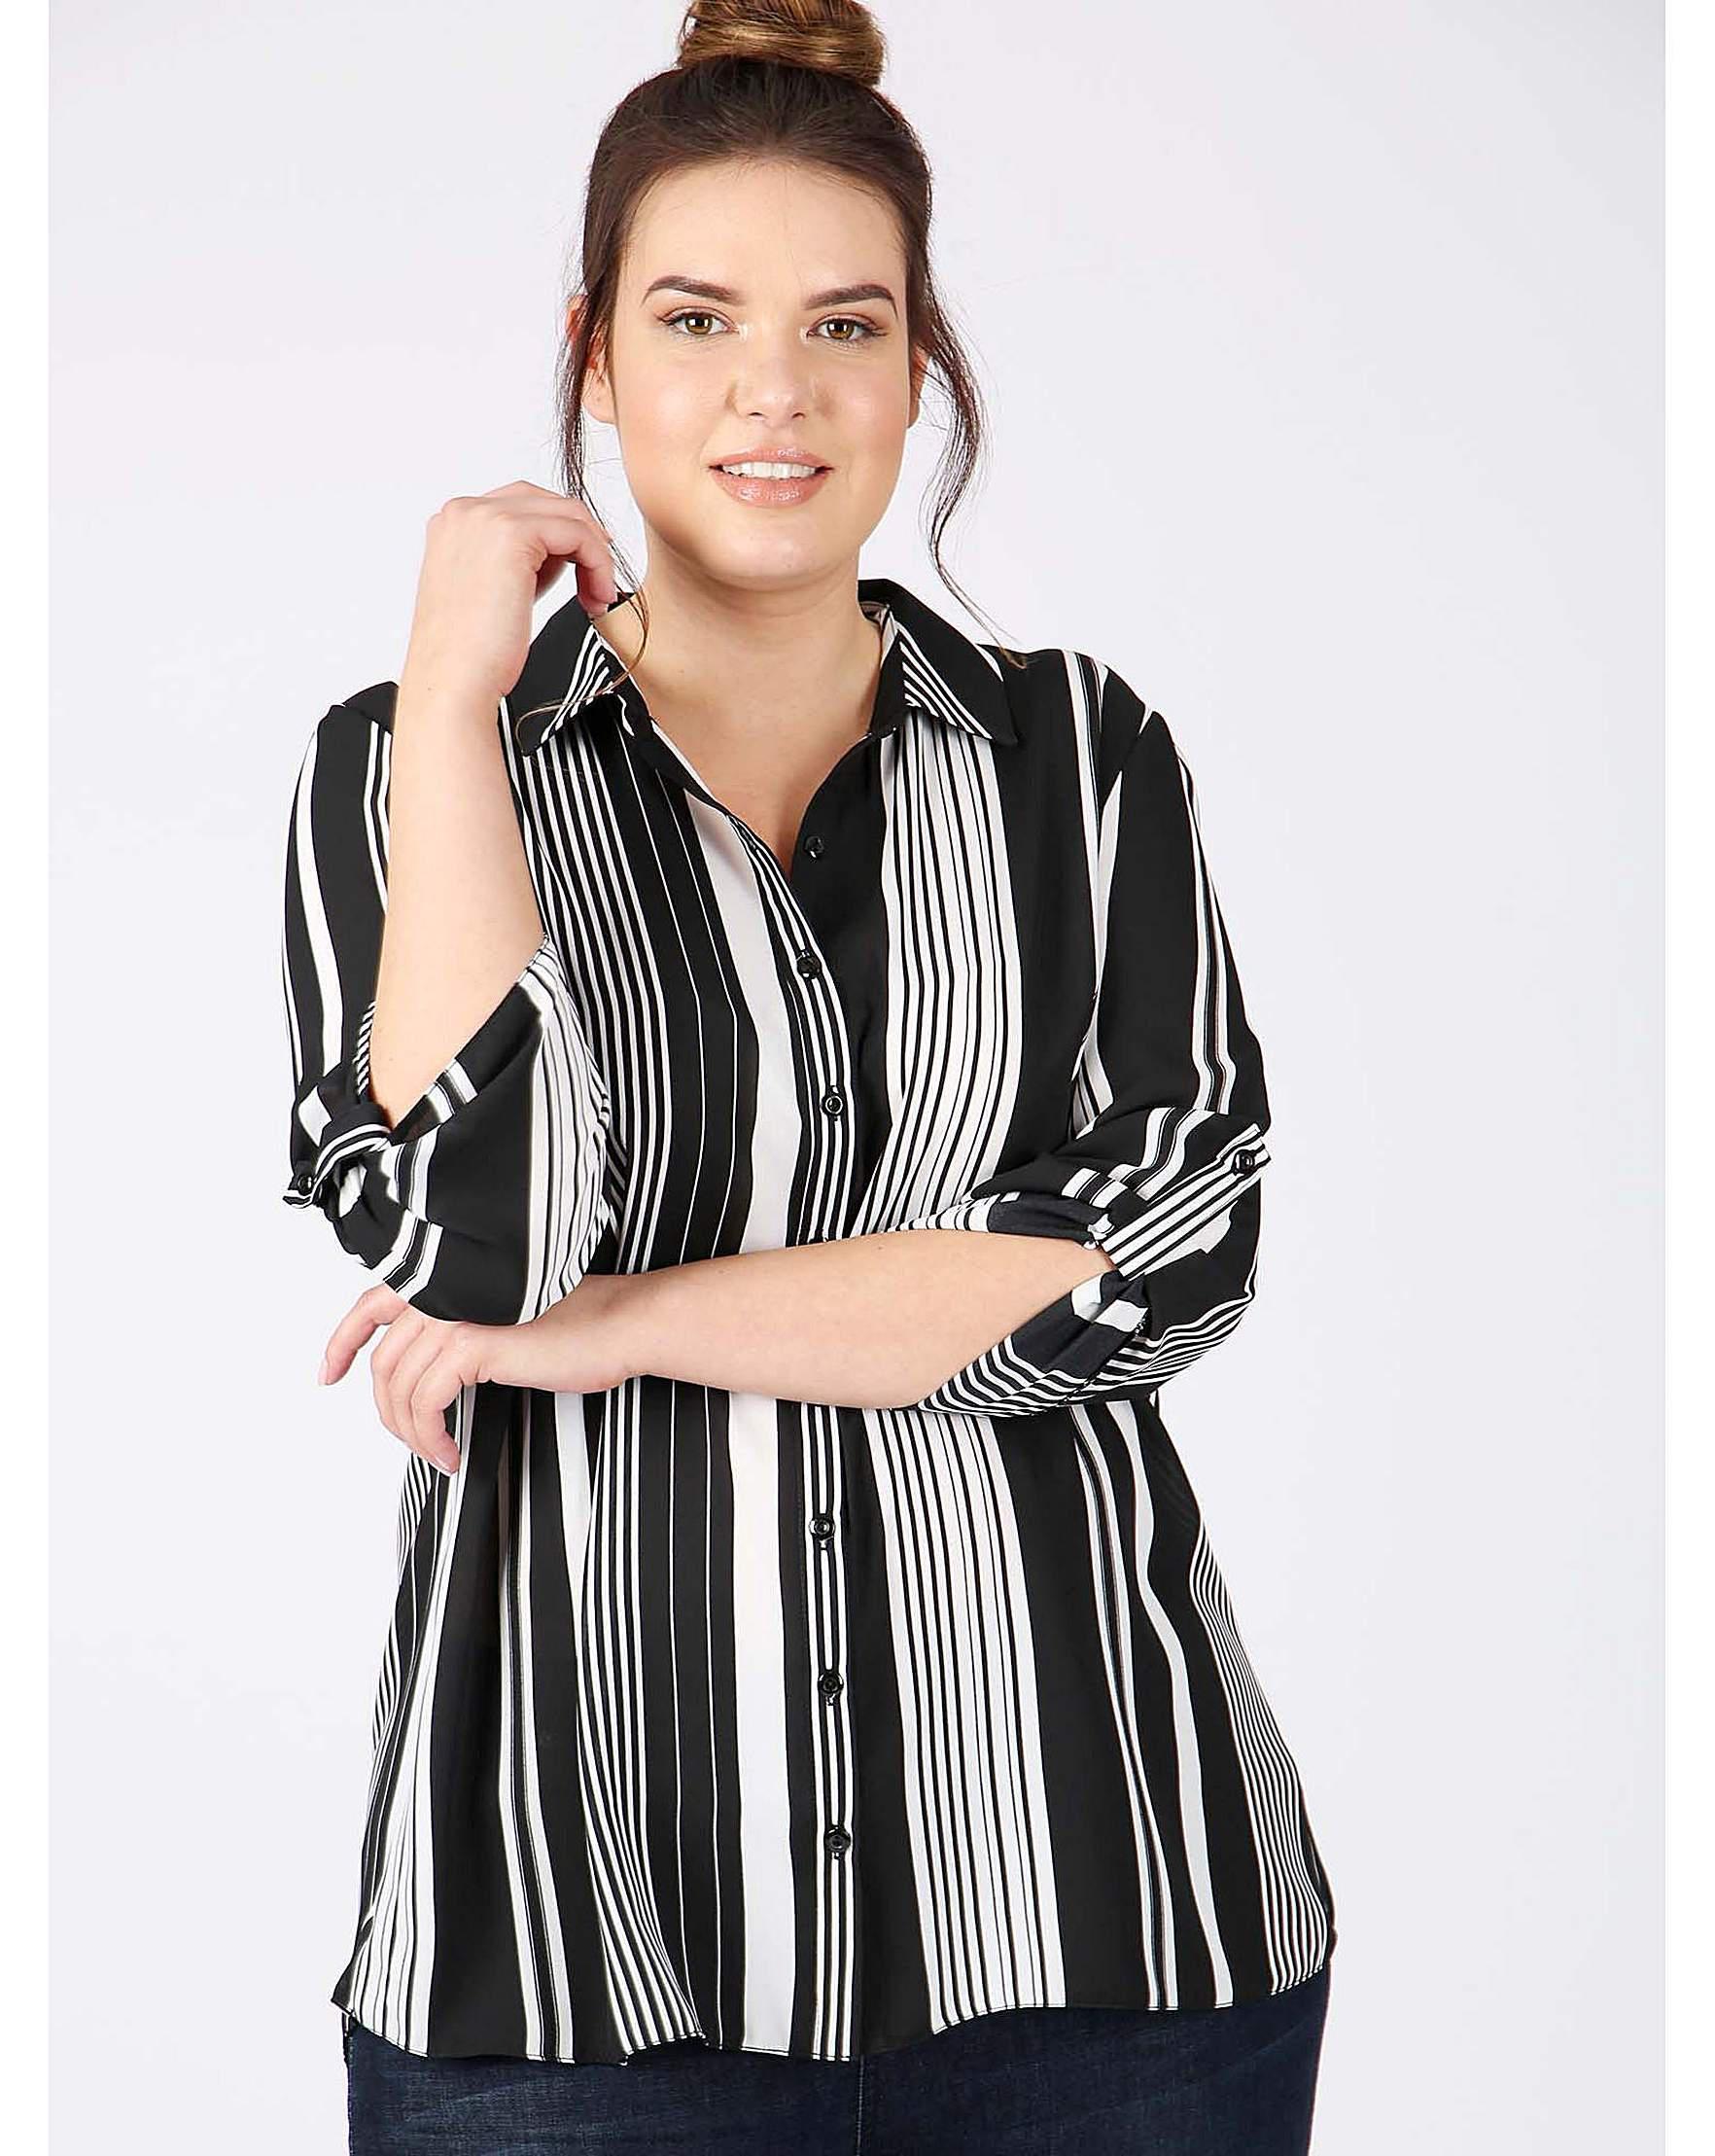 493da2be7d5017 Freya Lovedrobe Gb Black White Striped Shirt in Black - Lyst